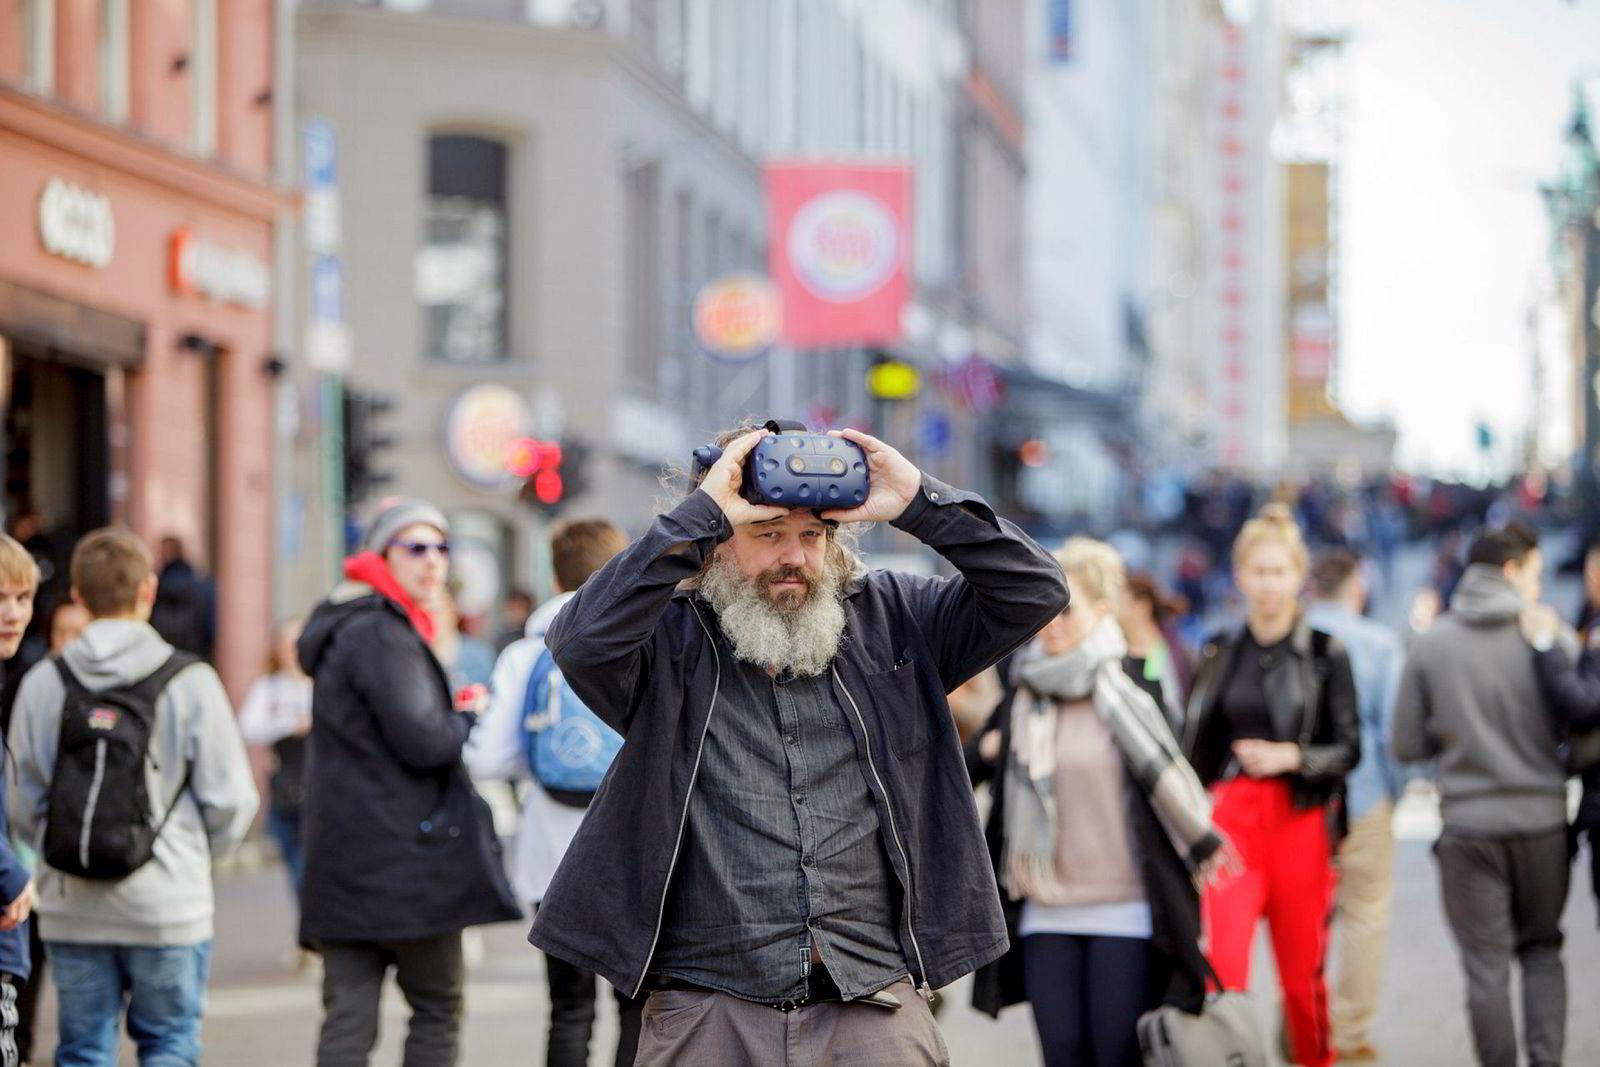 Torgeir Waterhouse tror ikke dagens VR-briller vil være løsningen på sikt.